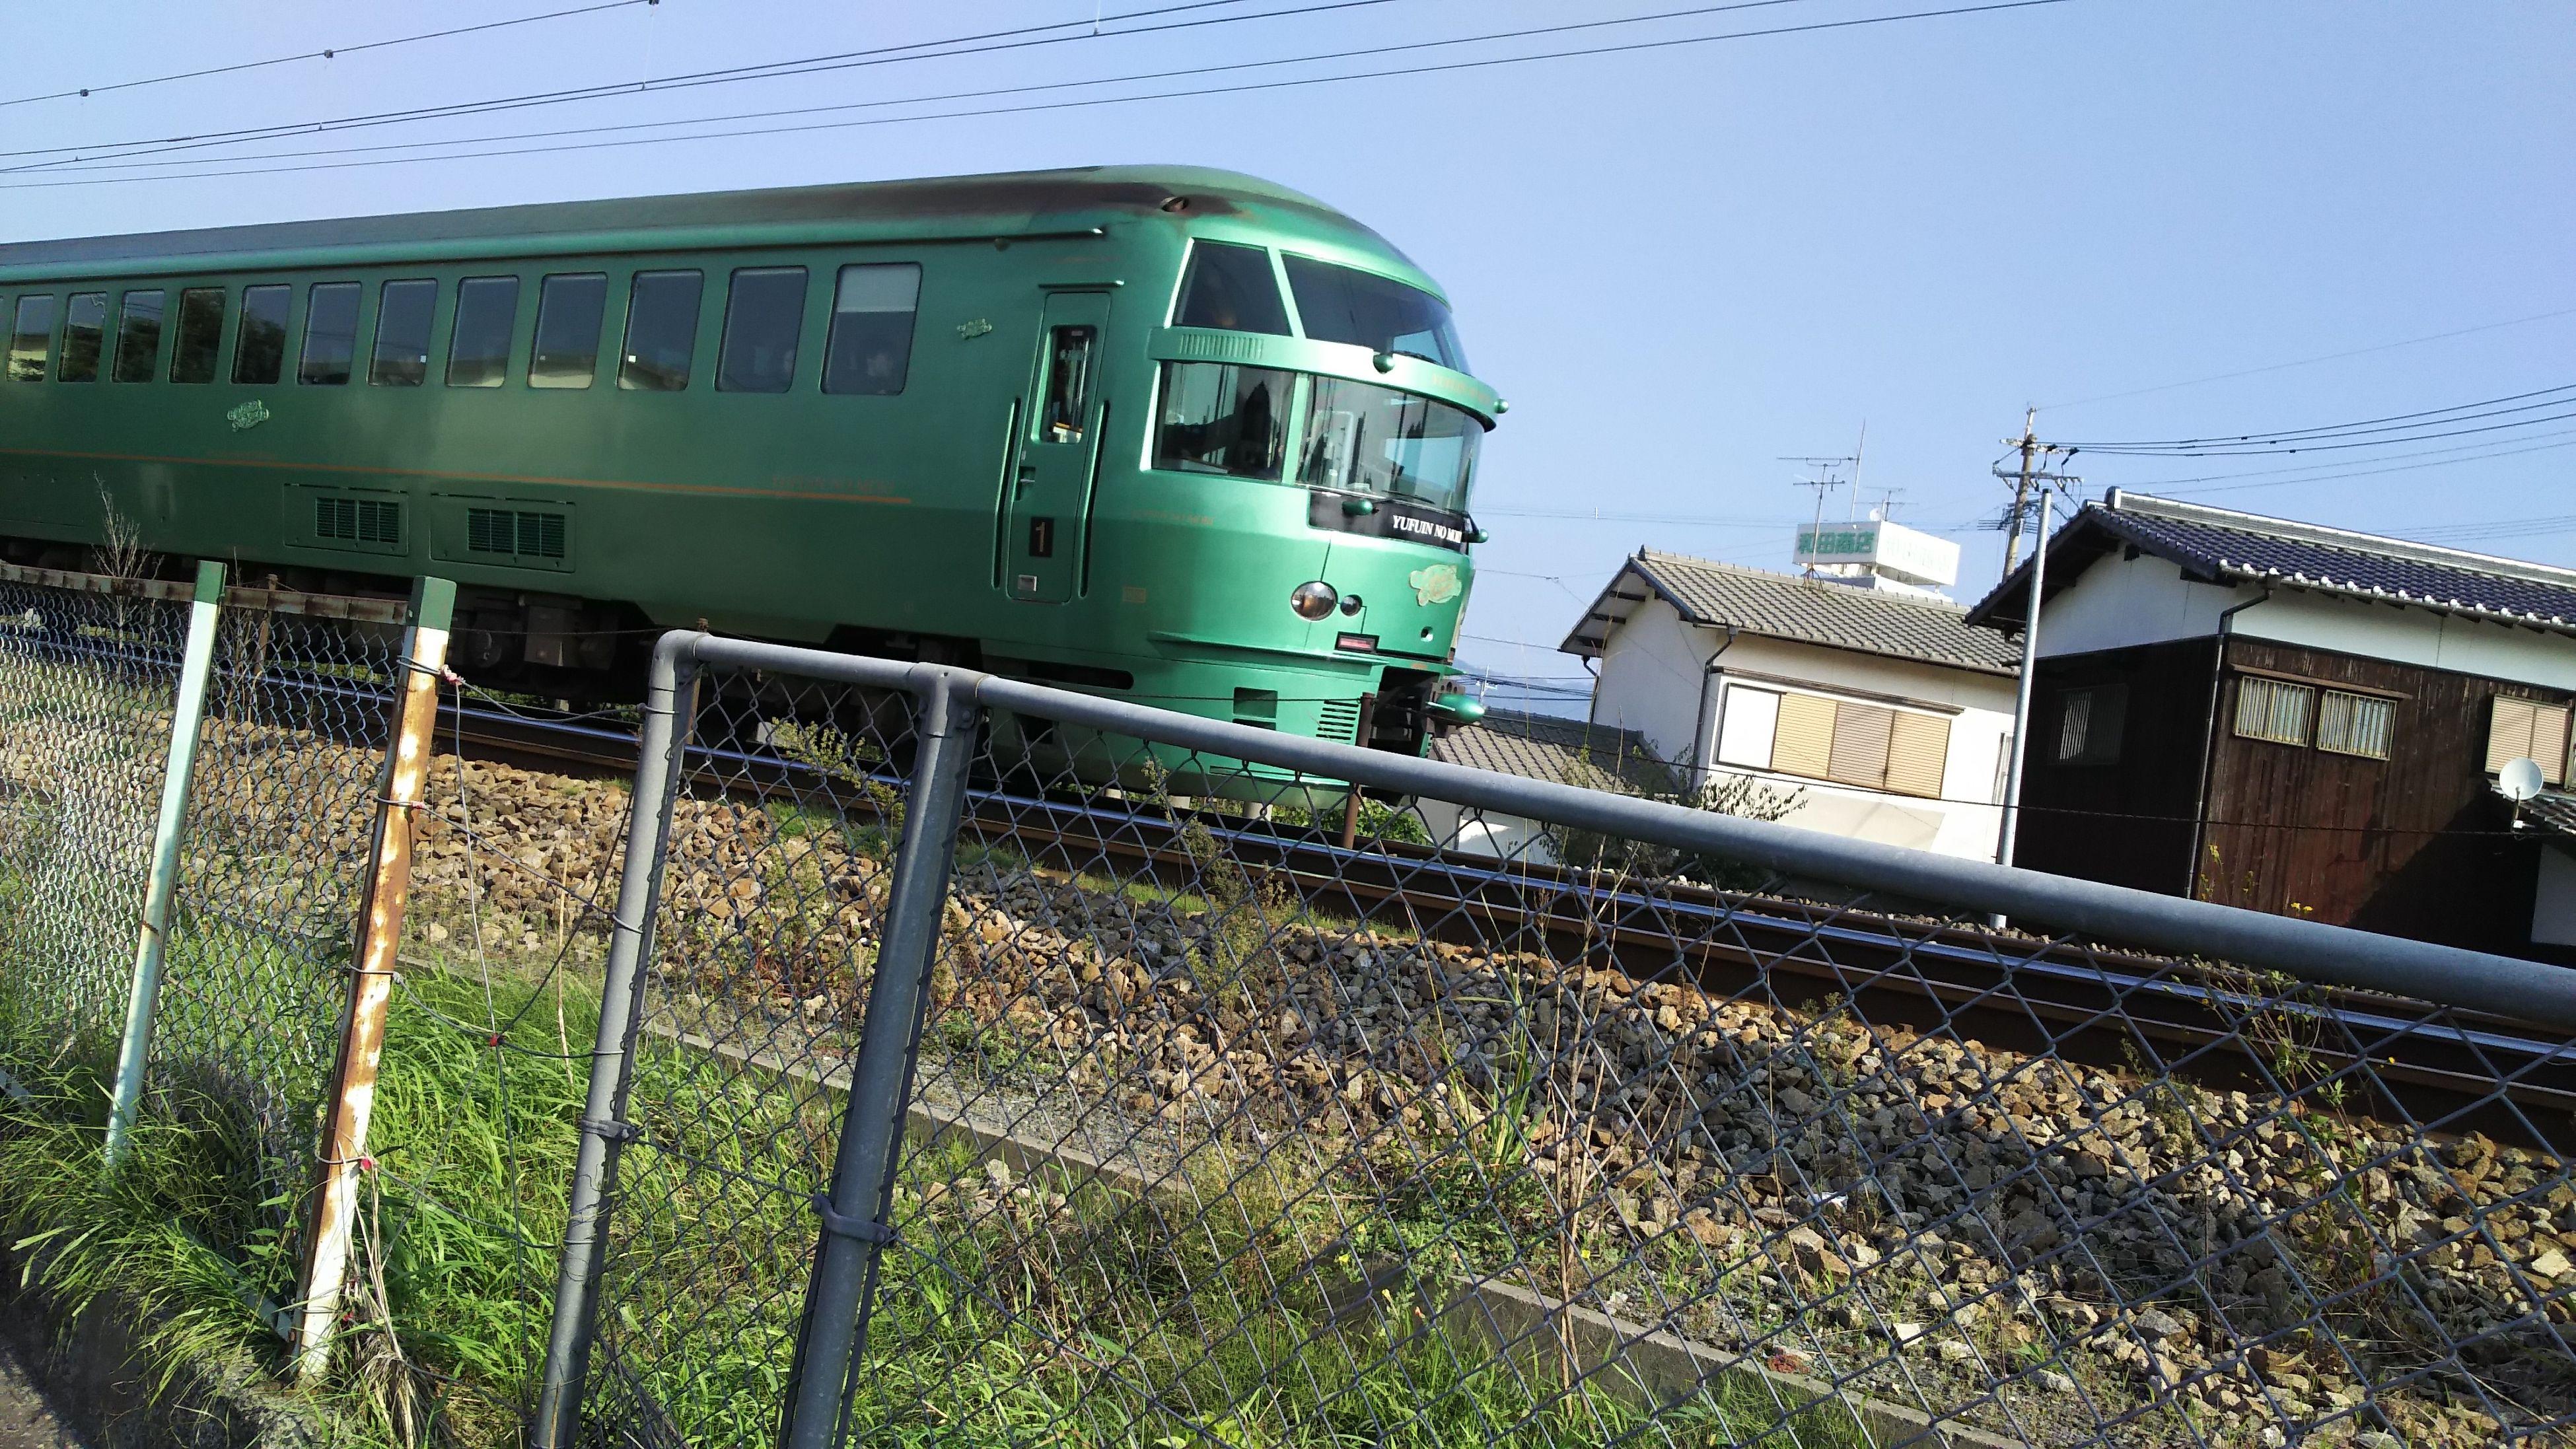 mode of transport, rail transportation, green color, outdoors, sunlight, day, public transportation, no people, sky